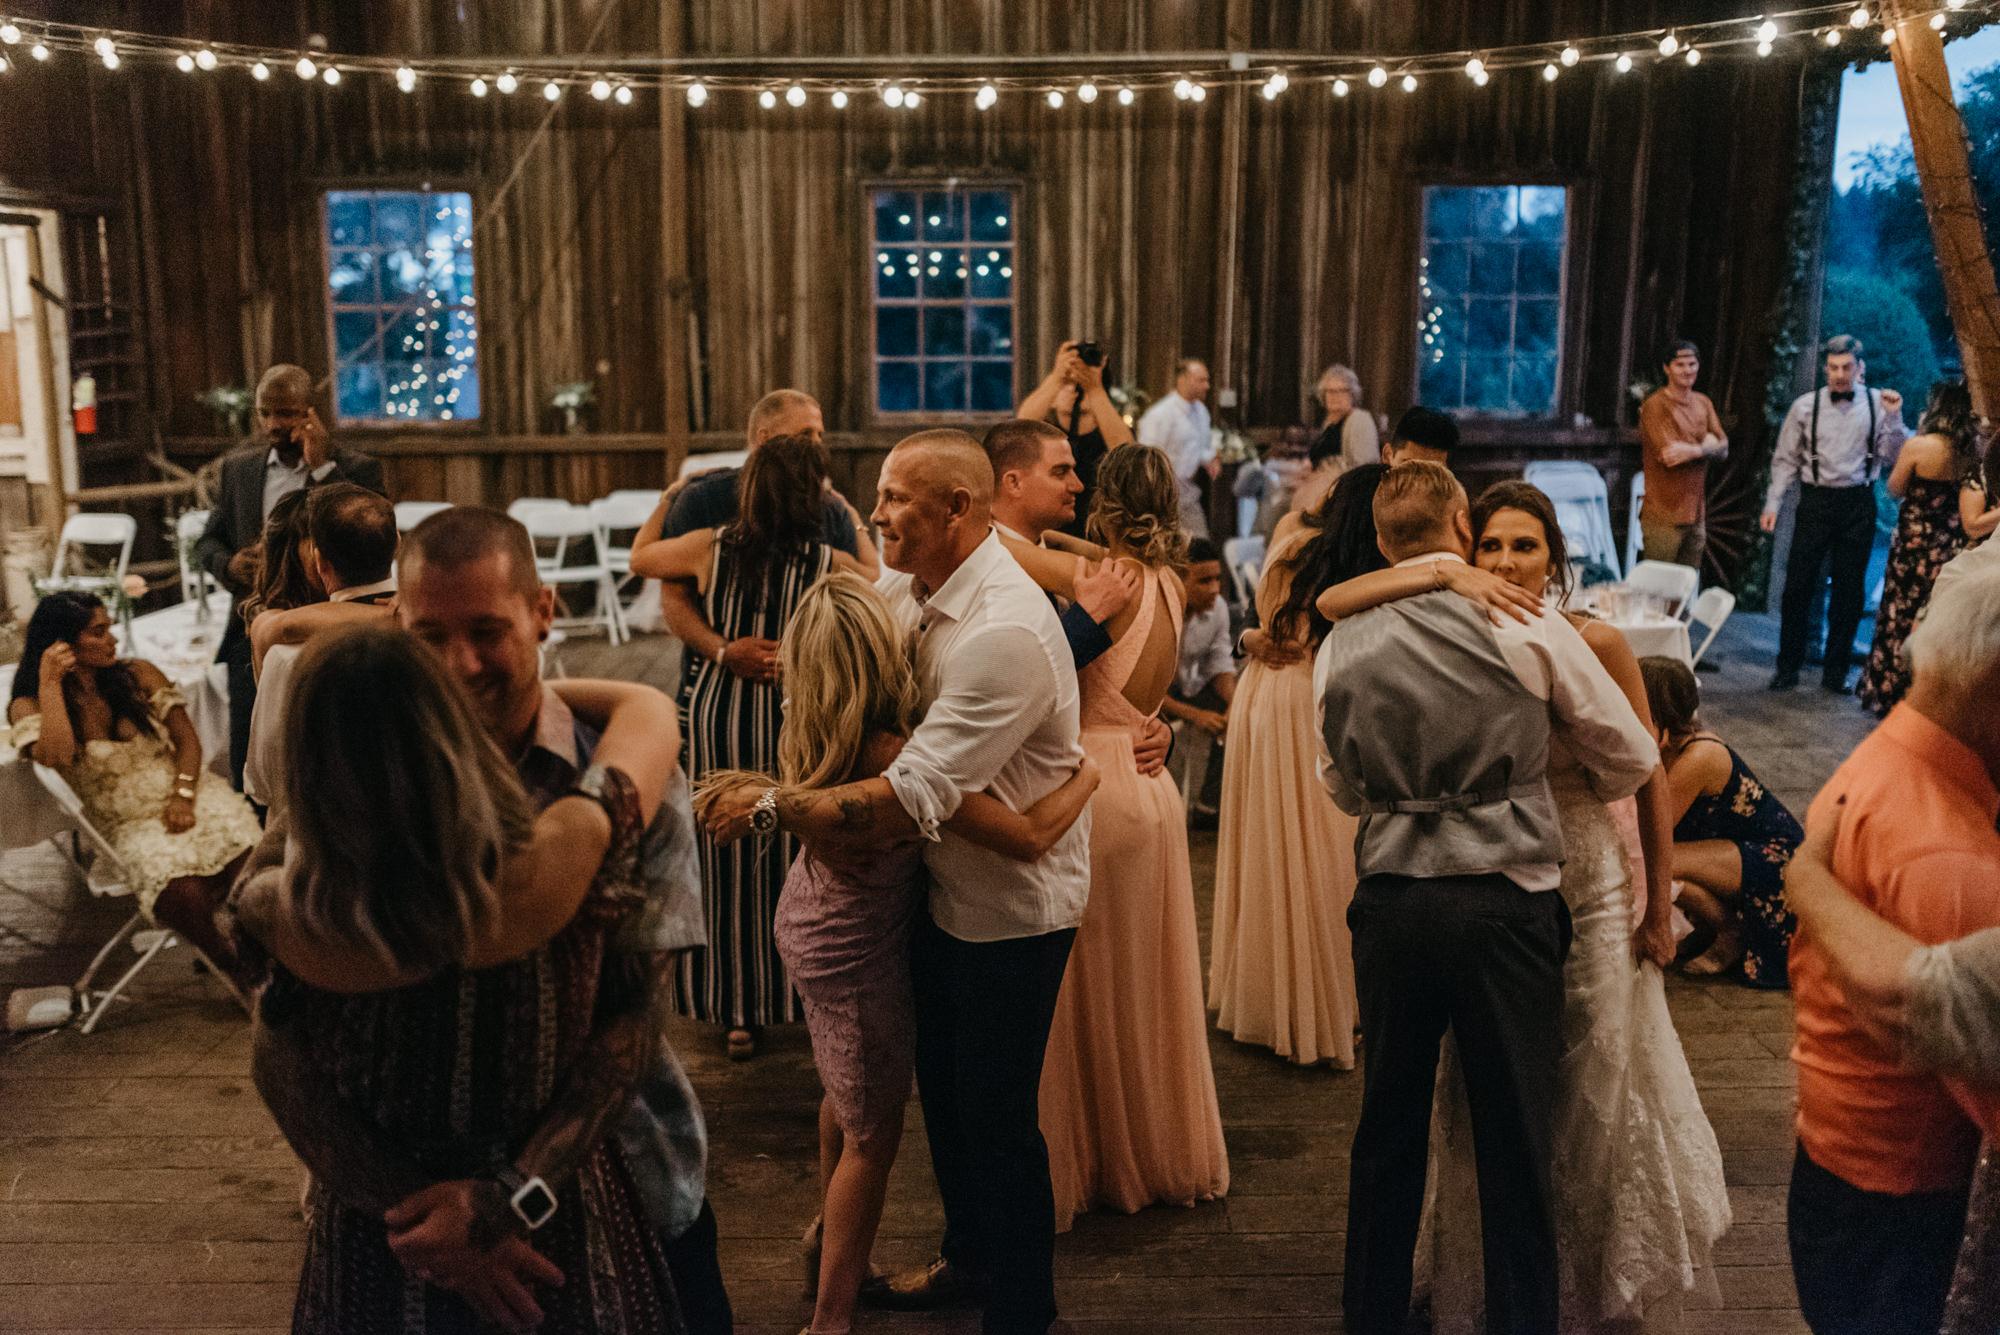 216-portland-northwest-wedding-bubble-exit-barn-string-lights.jpg